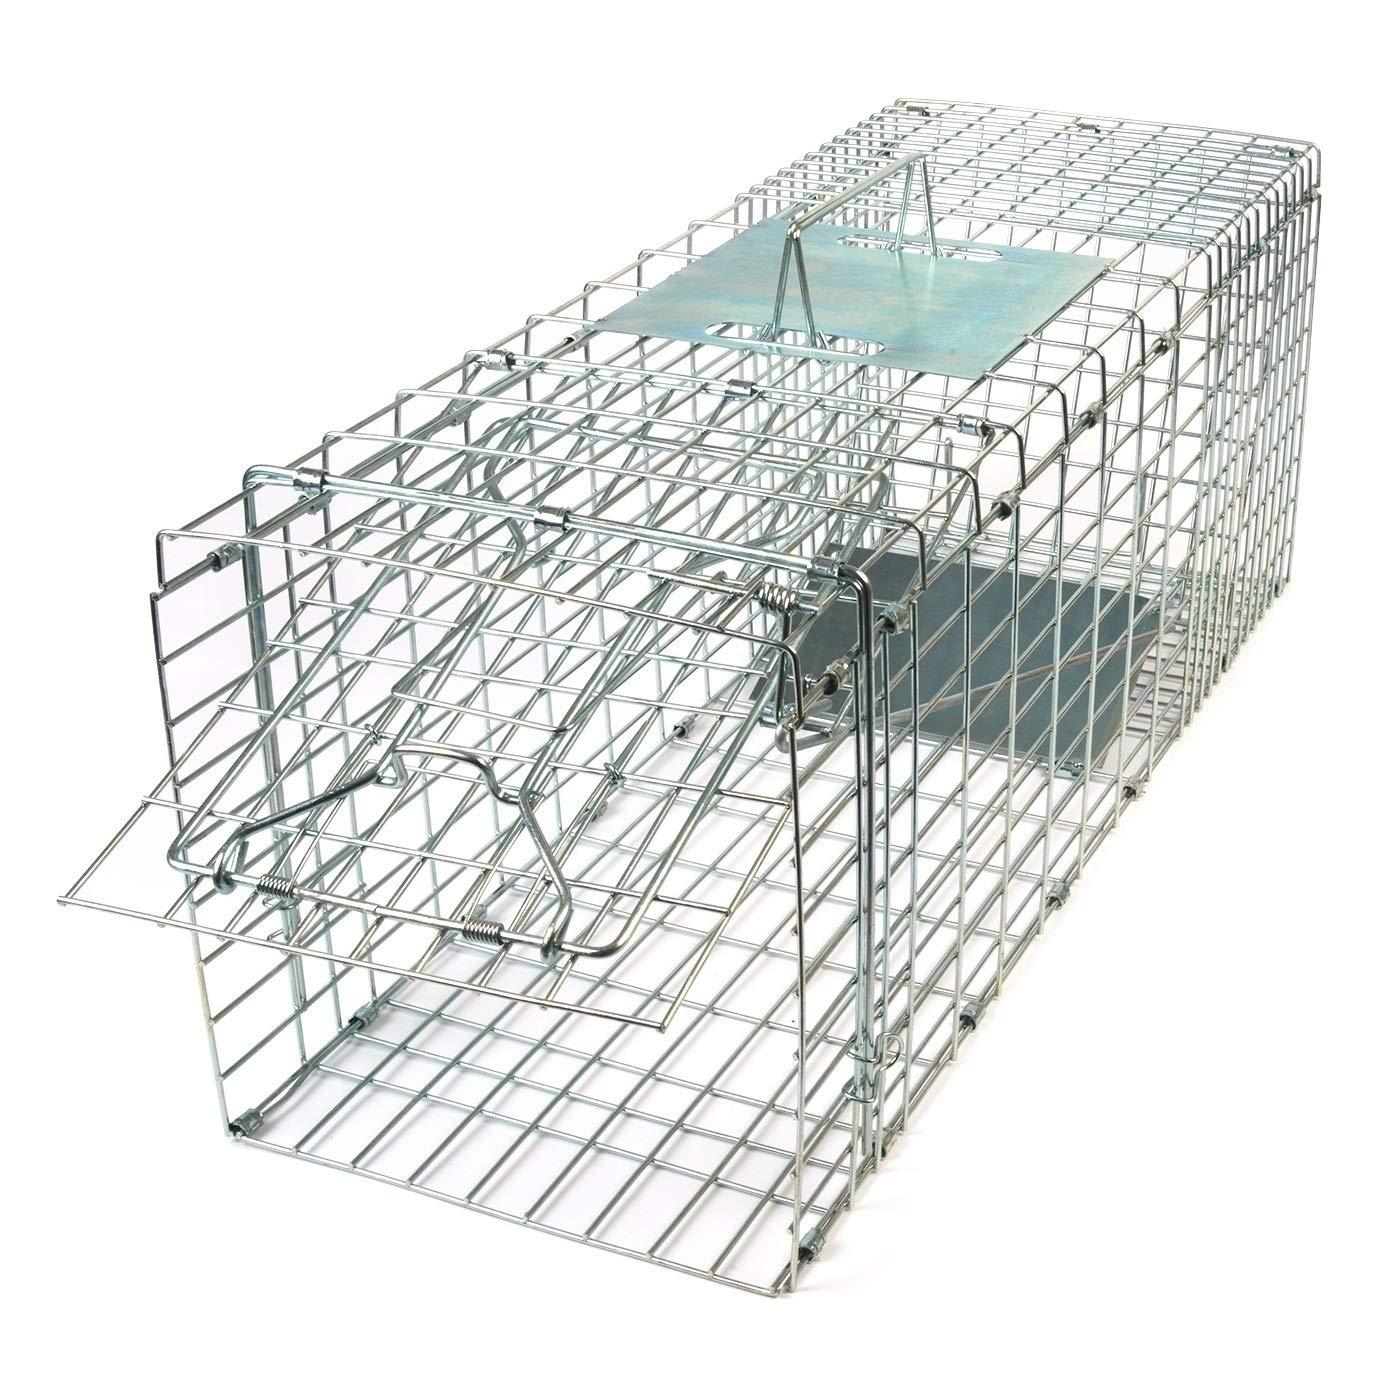 Gardigo - Jaula & Trasportín plegable de metal para mascota | Trampa de captura de animales vivos, gatos, perros, conejos, roedores - 66 x 23 x 26 cm 62360